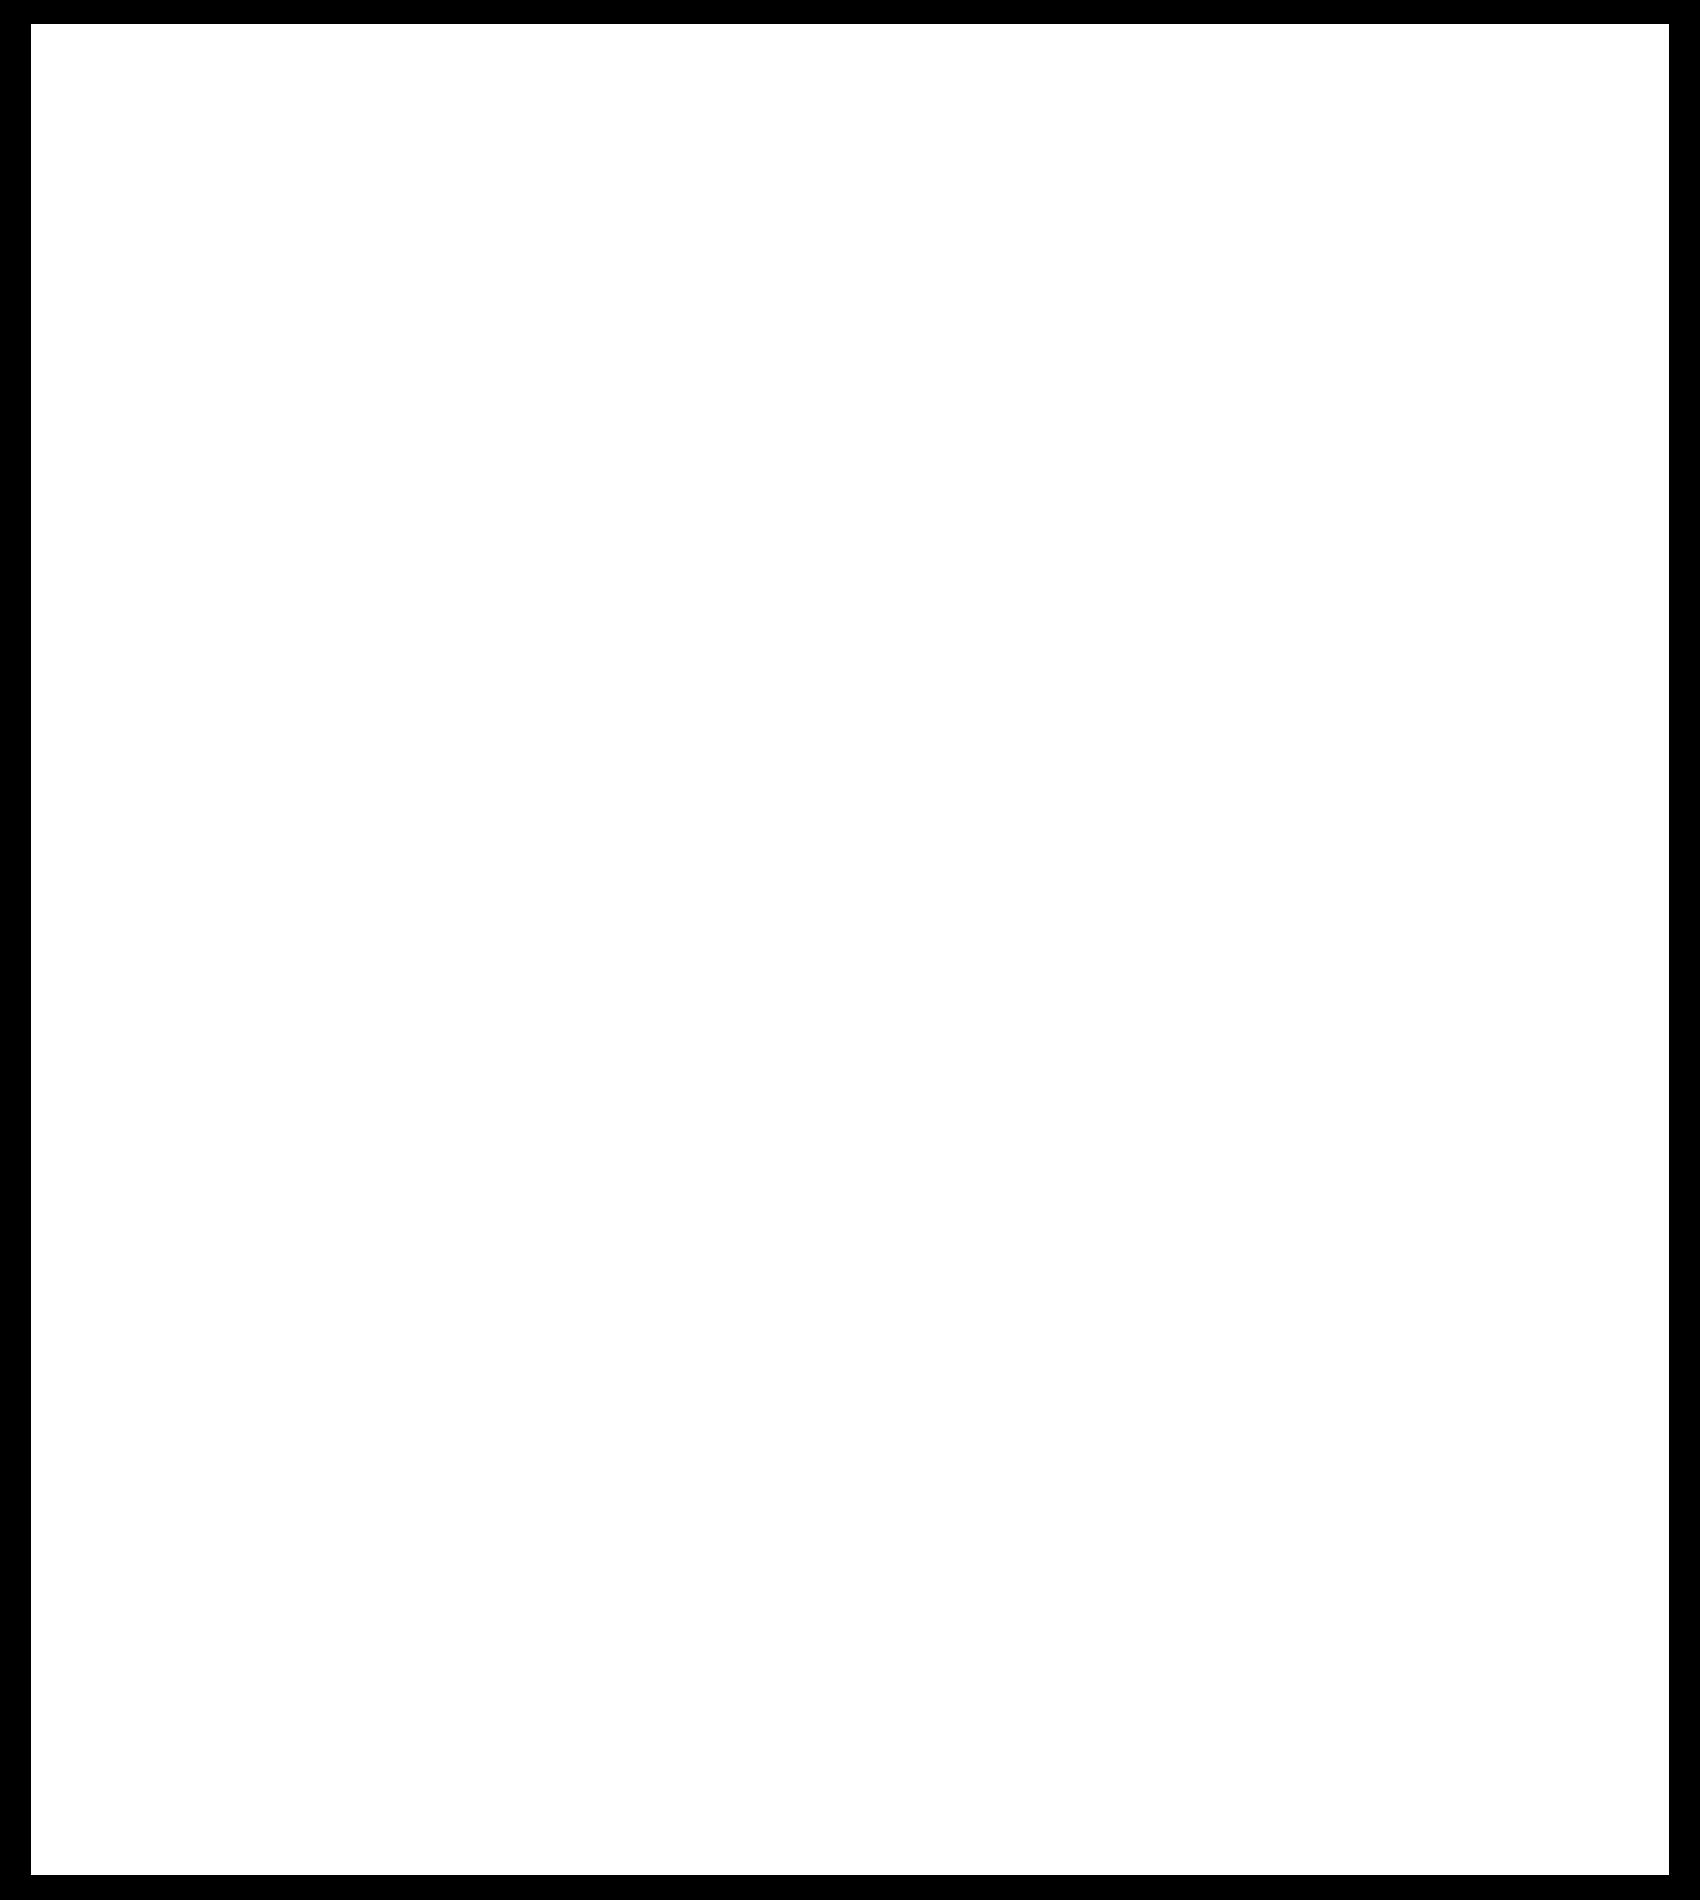 Black Square Outline